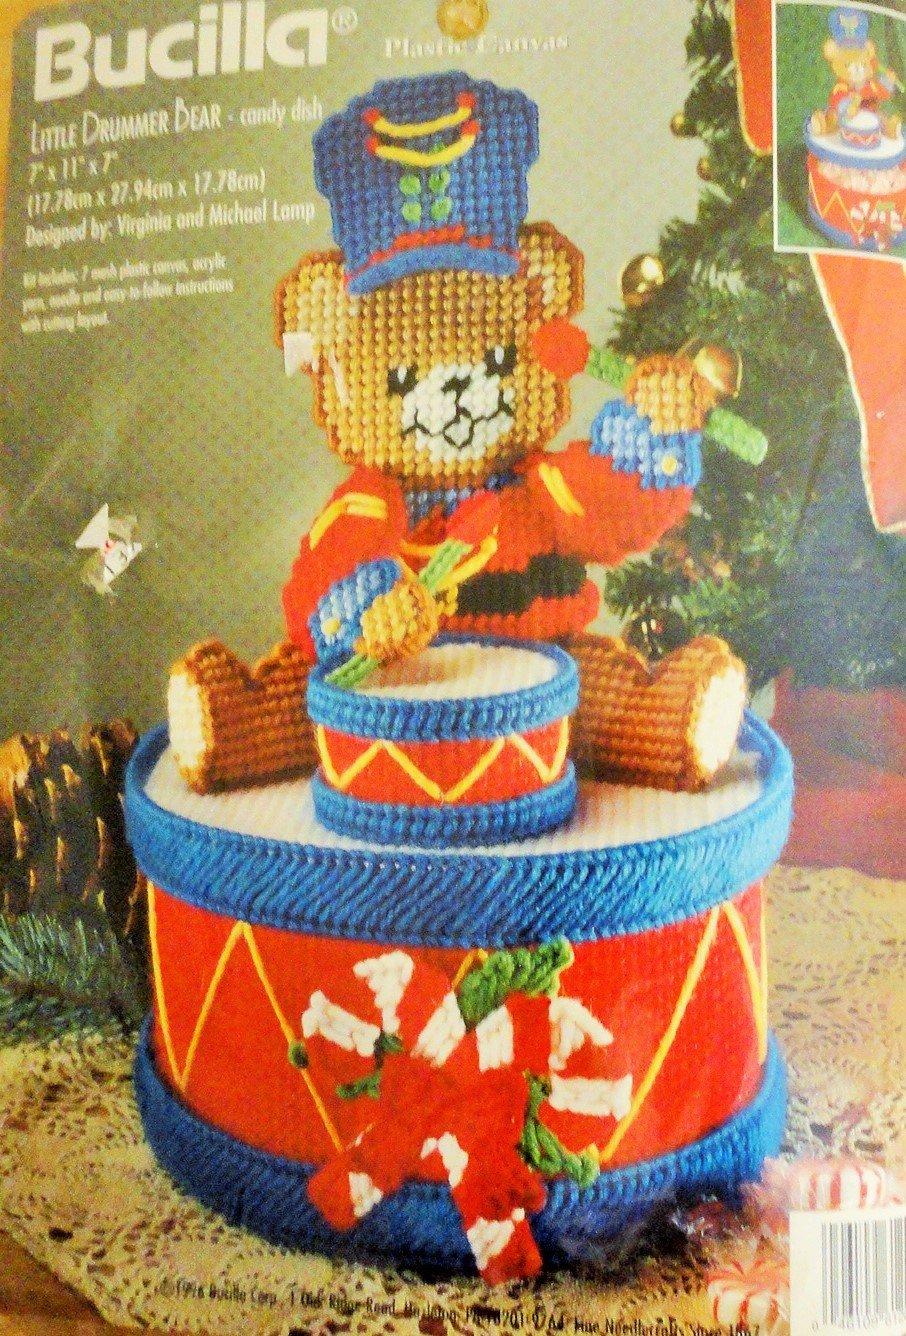 Bucilla Little Drummer Bear Candy Dish Plastic Canvas Kit 61209